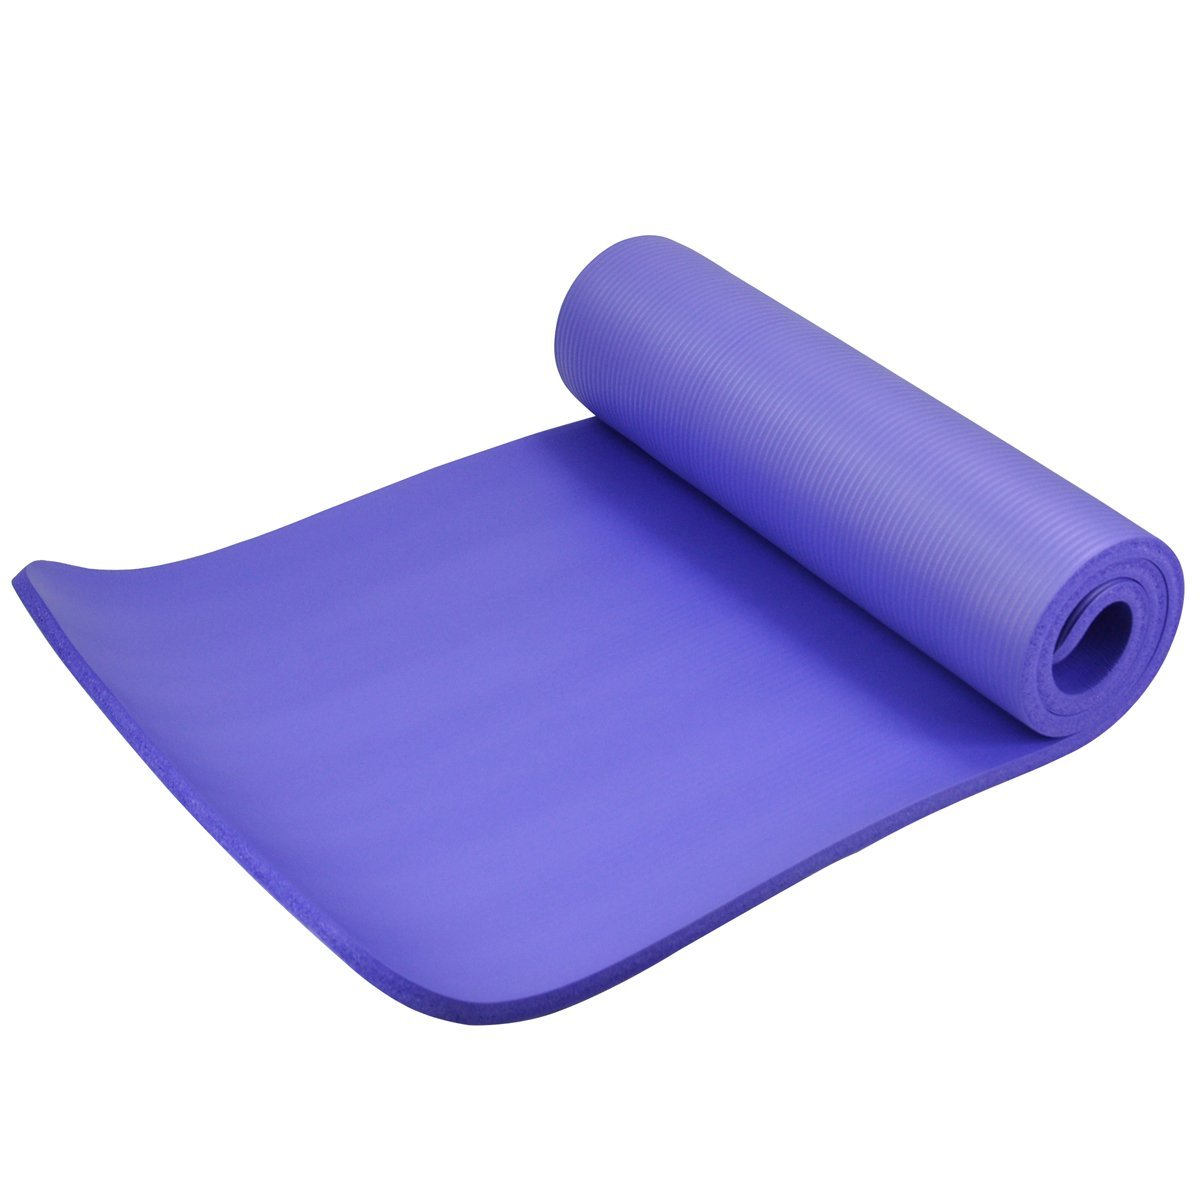 exercise yoga mat boxing fitness training pilates non slip surface purple b6x9. Black Bedroom Furniture Sets. Home Design Ideas